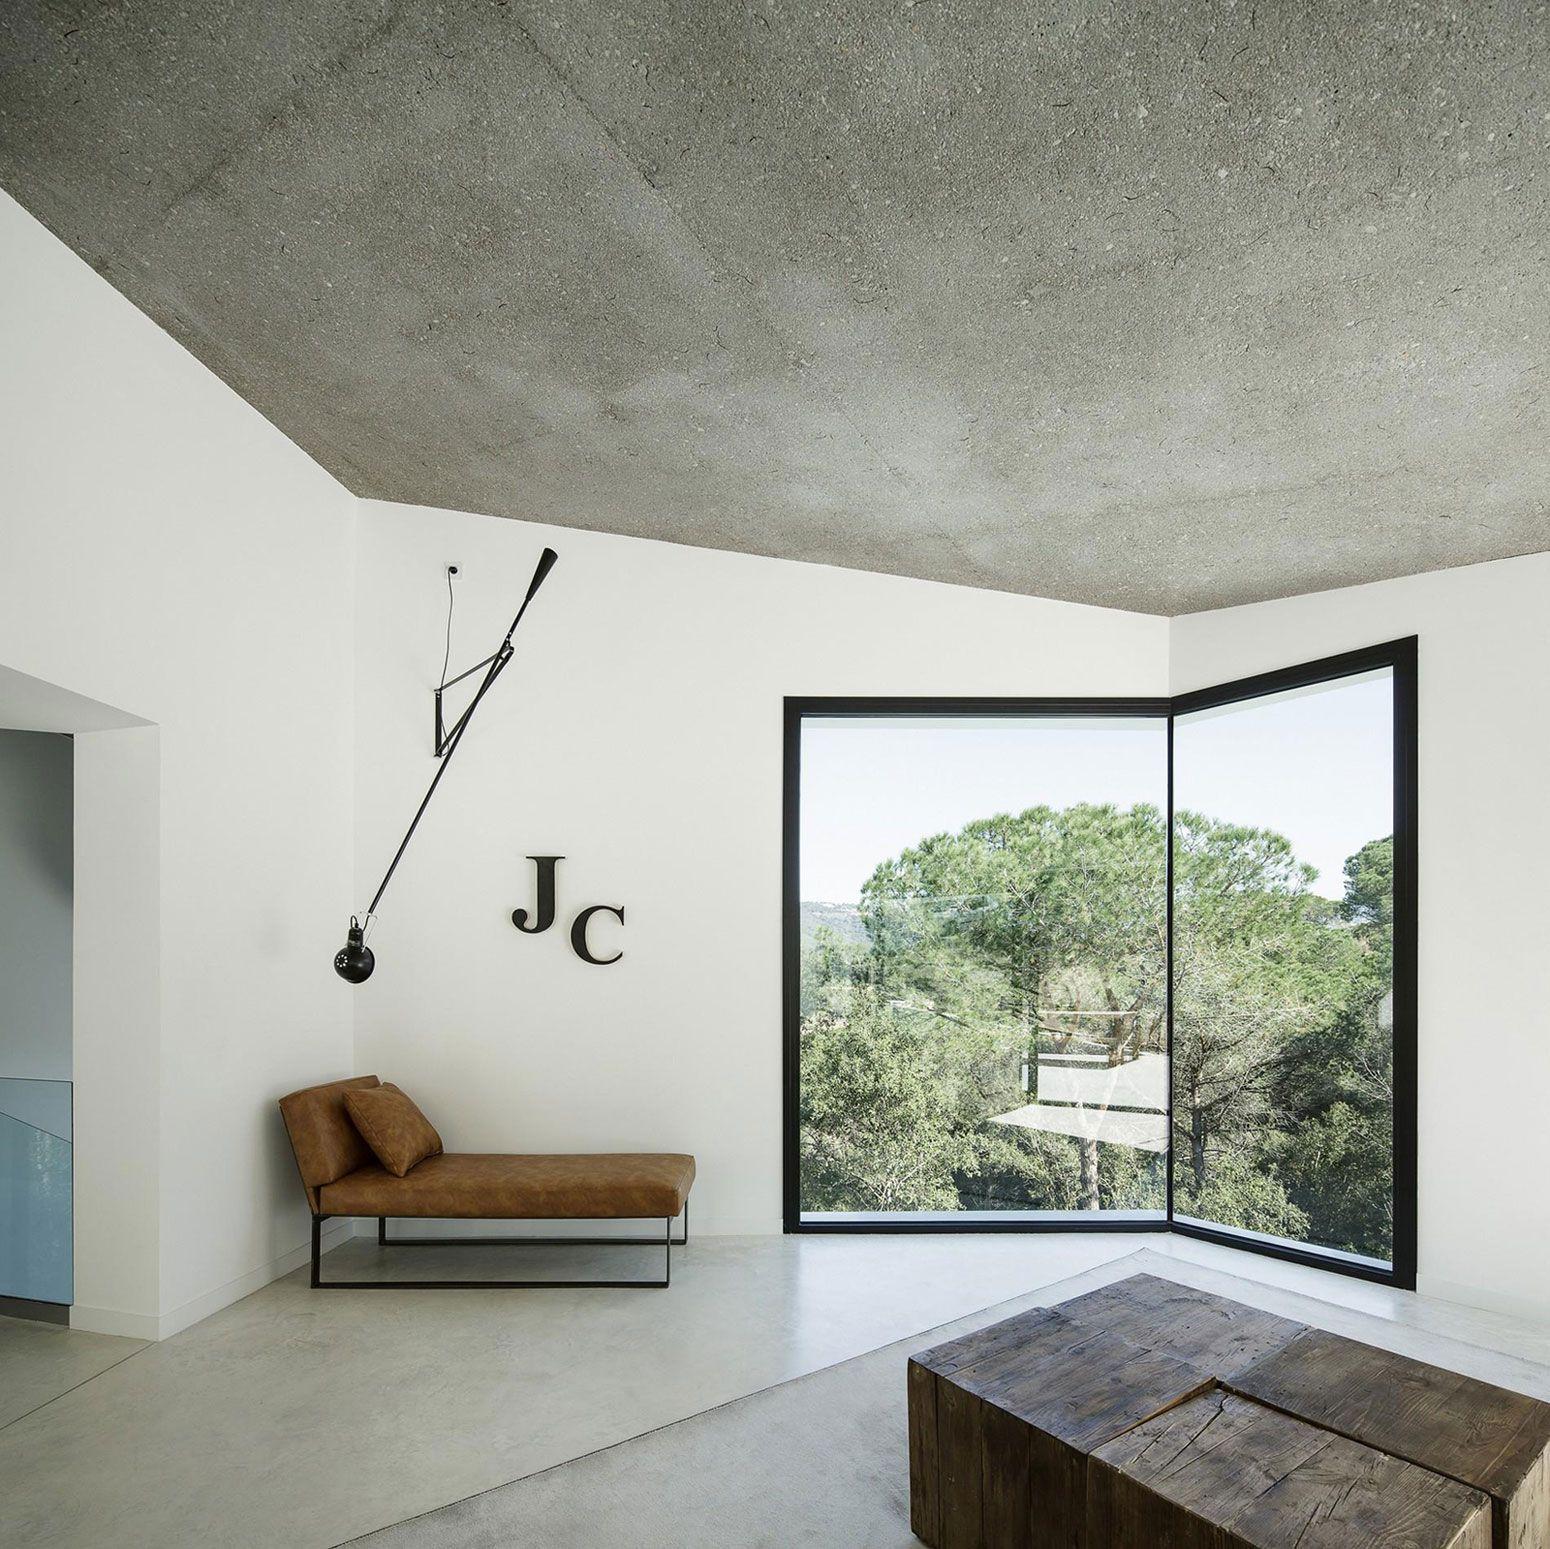 House-JC-04